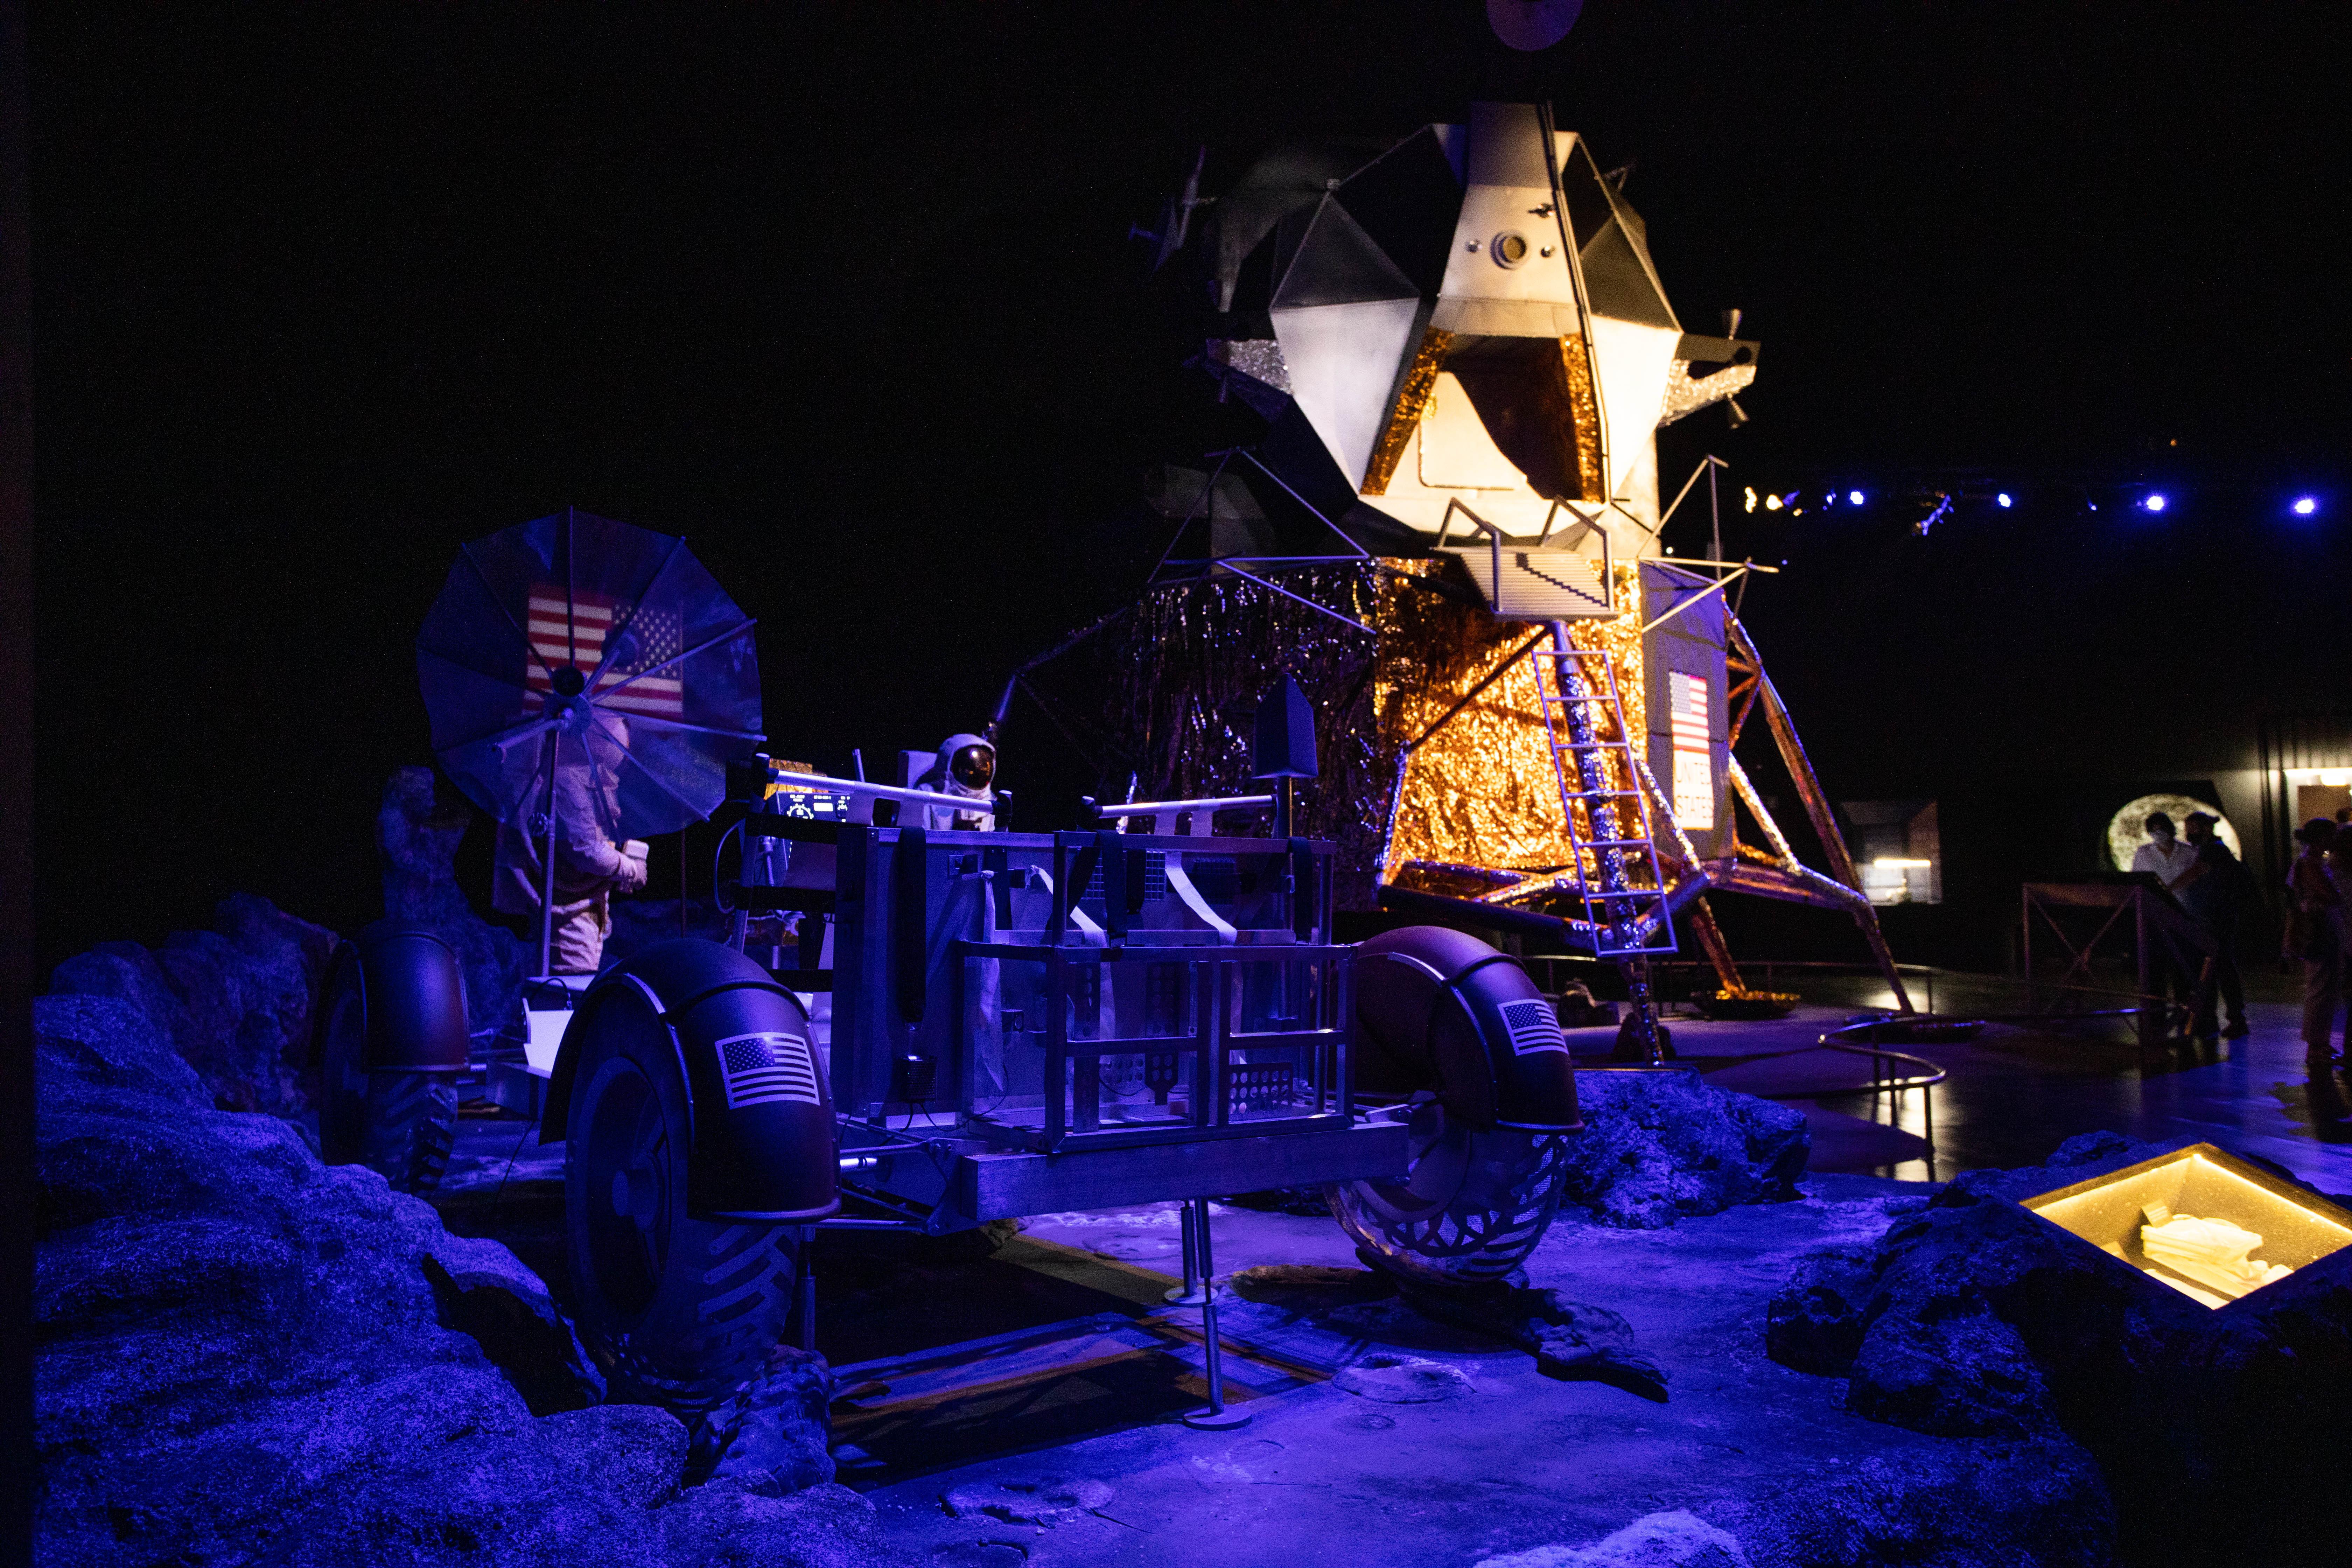 Veículos lunares aparecem lado a lado.